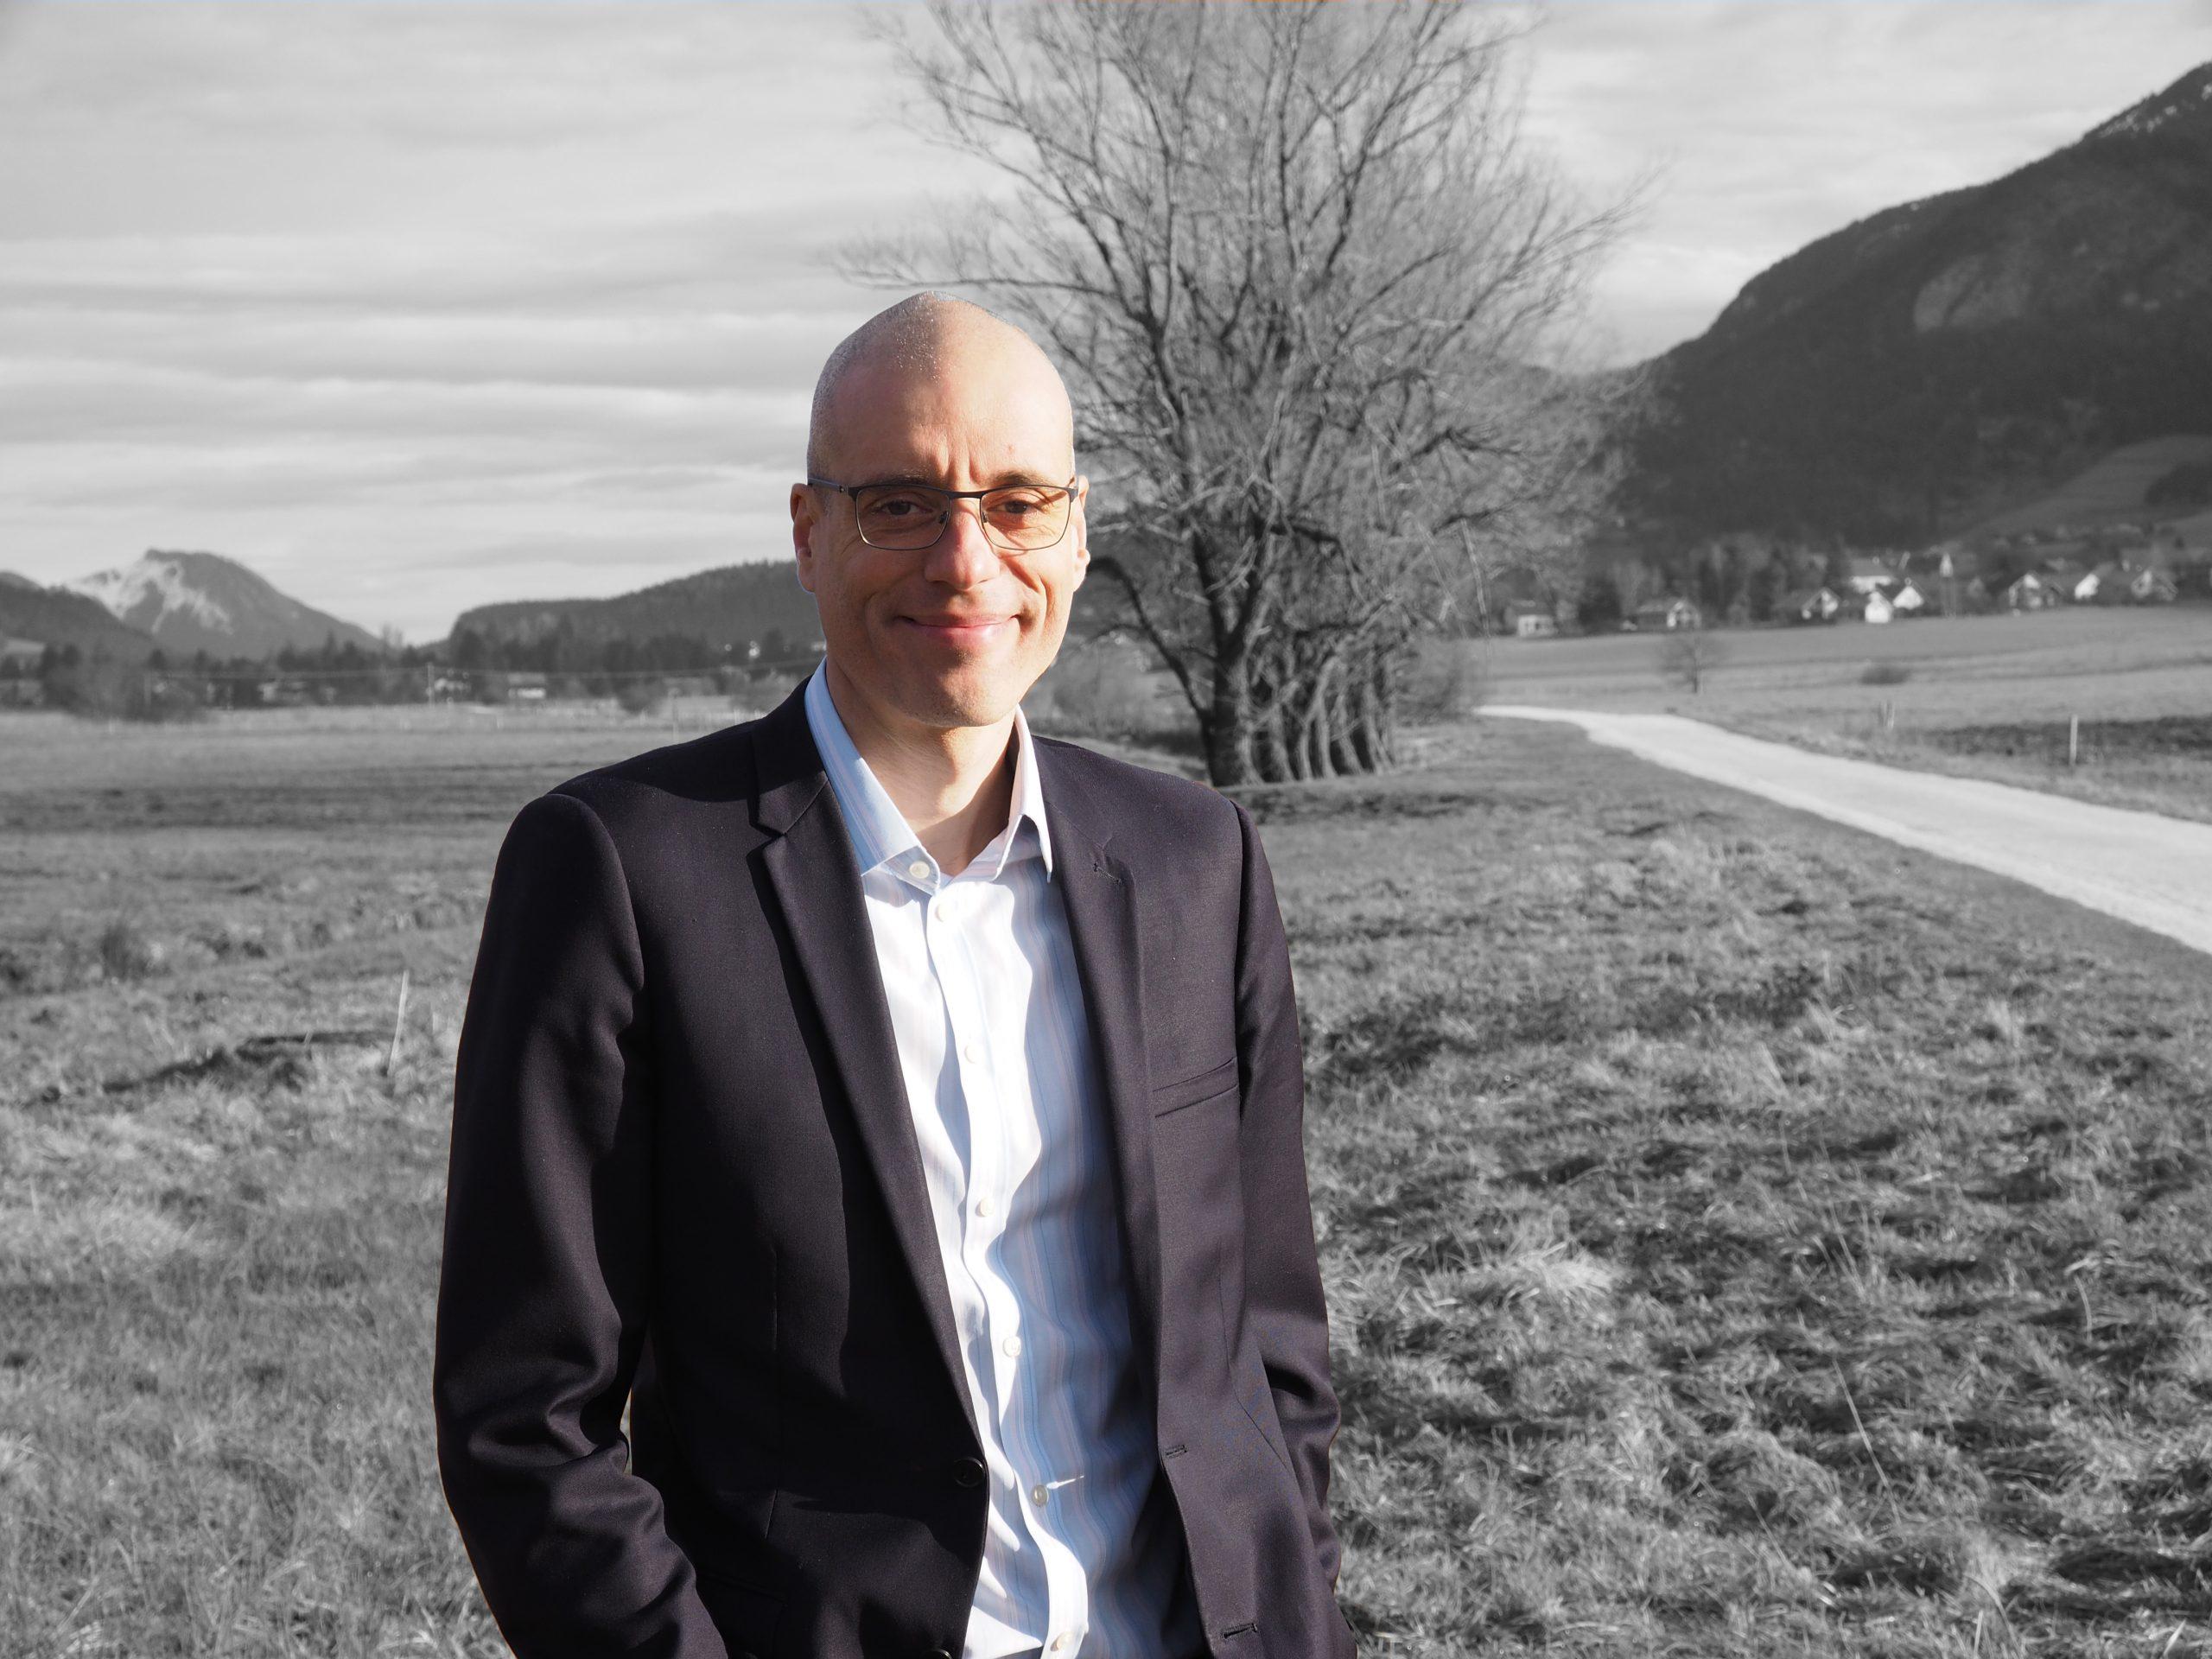 Michaël Kraemer